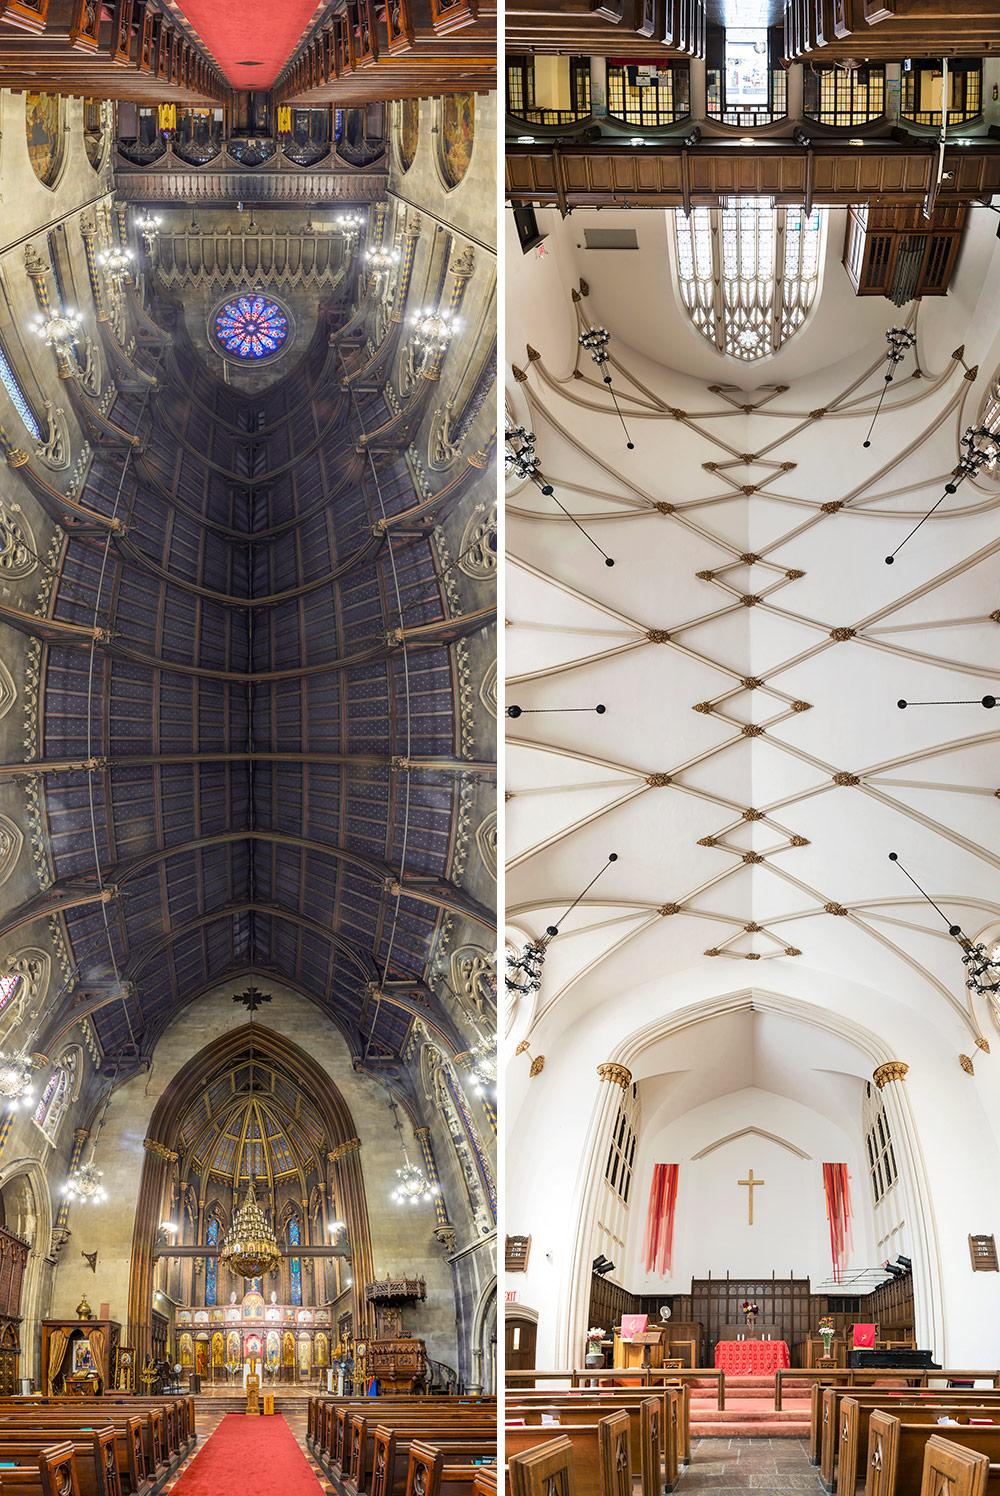 chiese-new-york-interno-foto-panoramiche-verticali-richard-silver-6